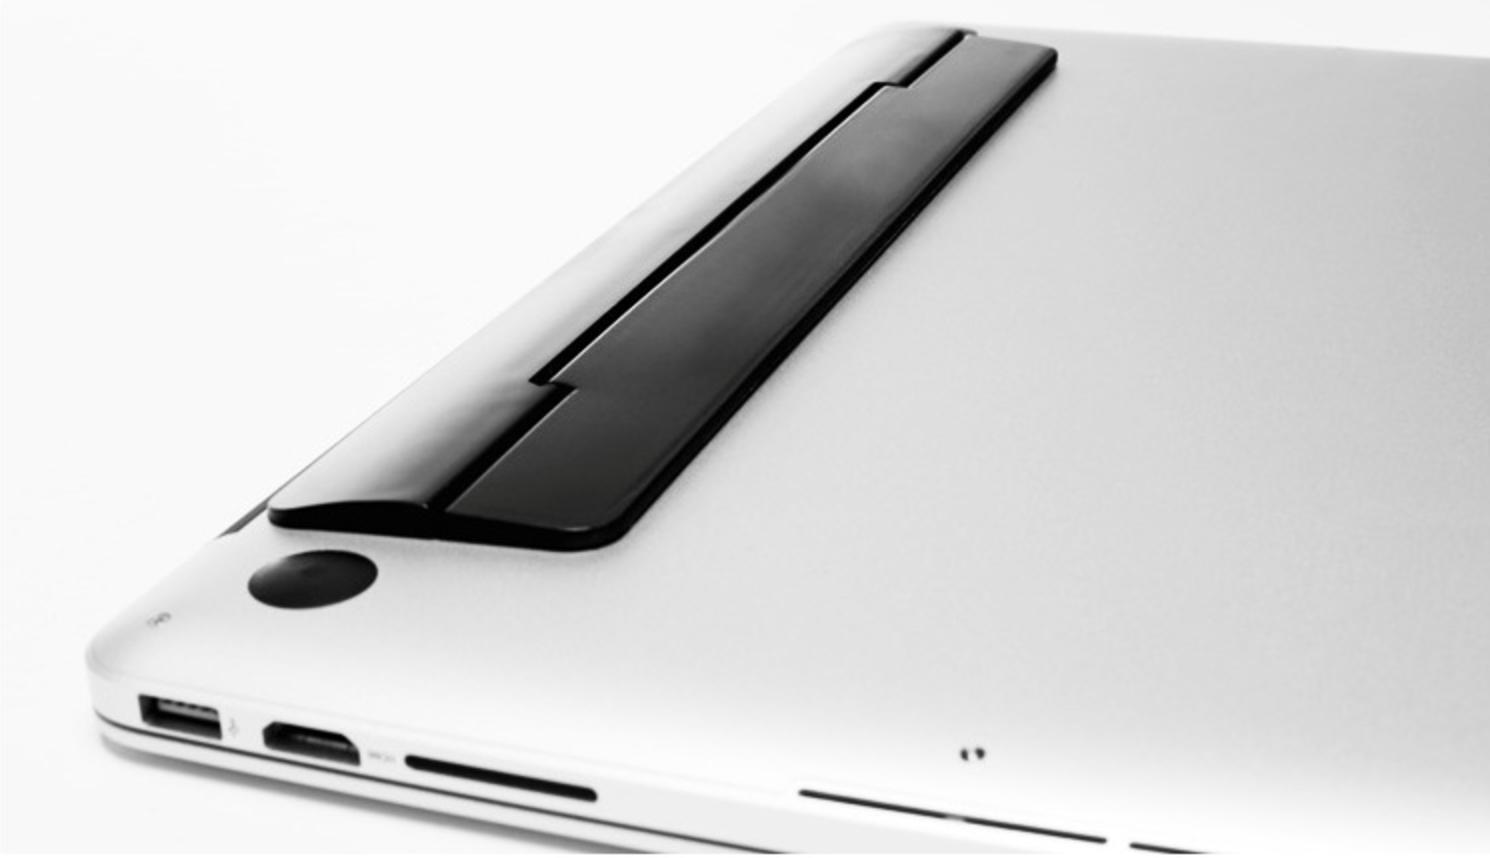 Kicklip nâng cao macbook